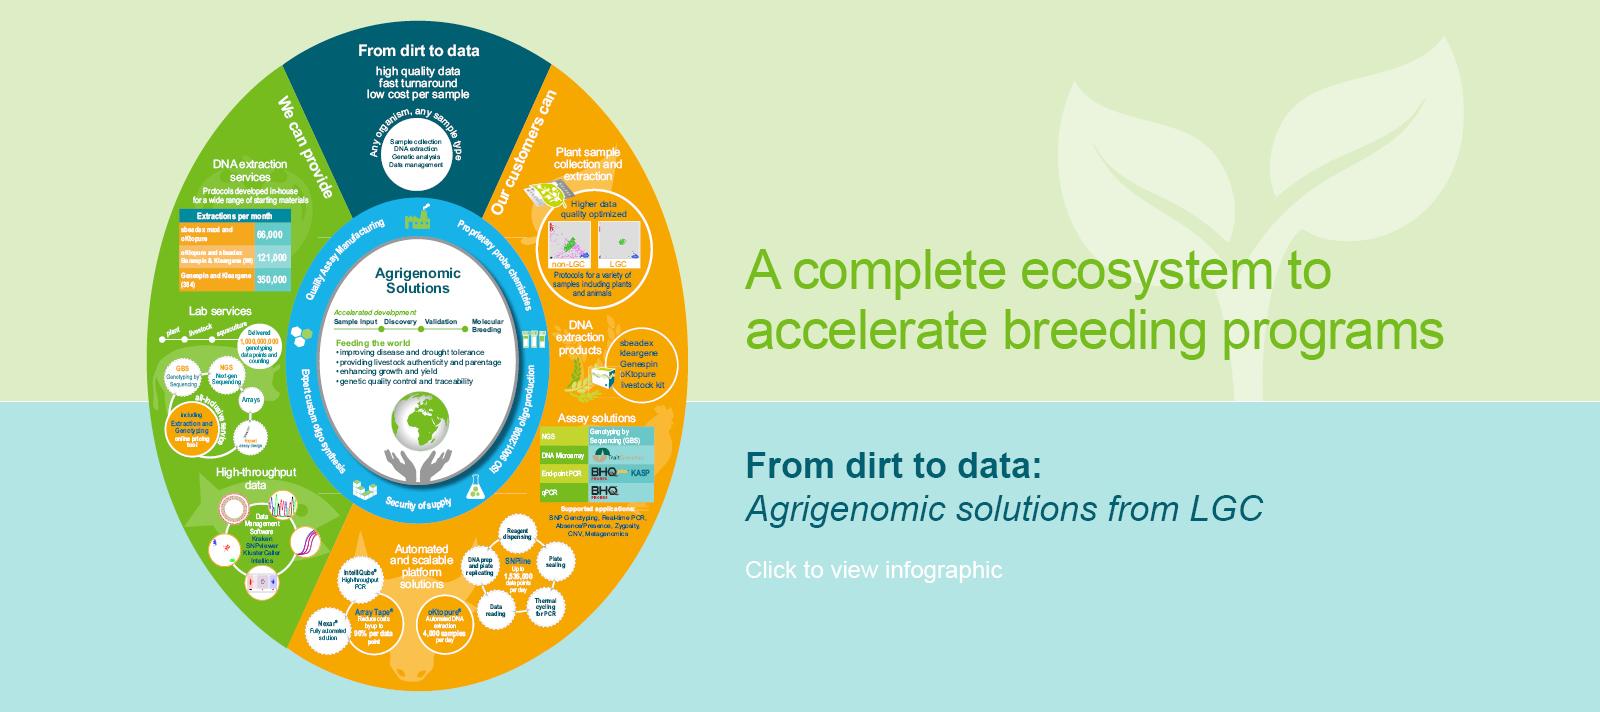 ecosystem-infographic-hero-banner-1600x712.jpg